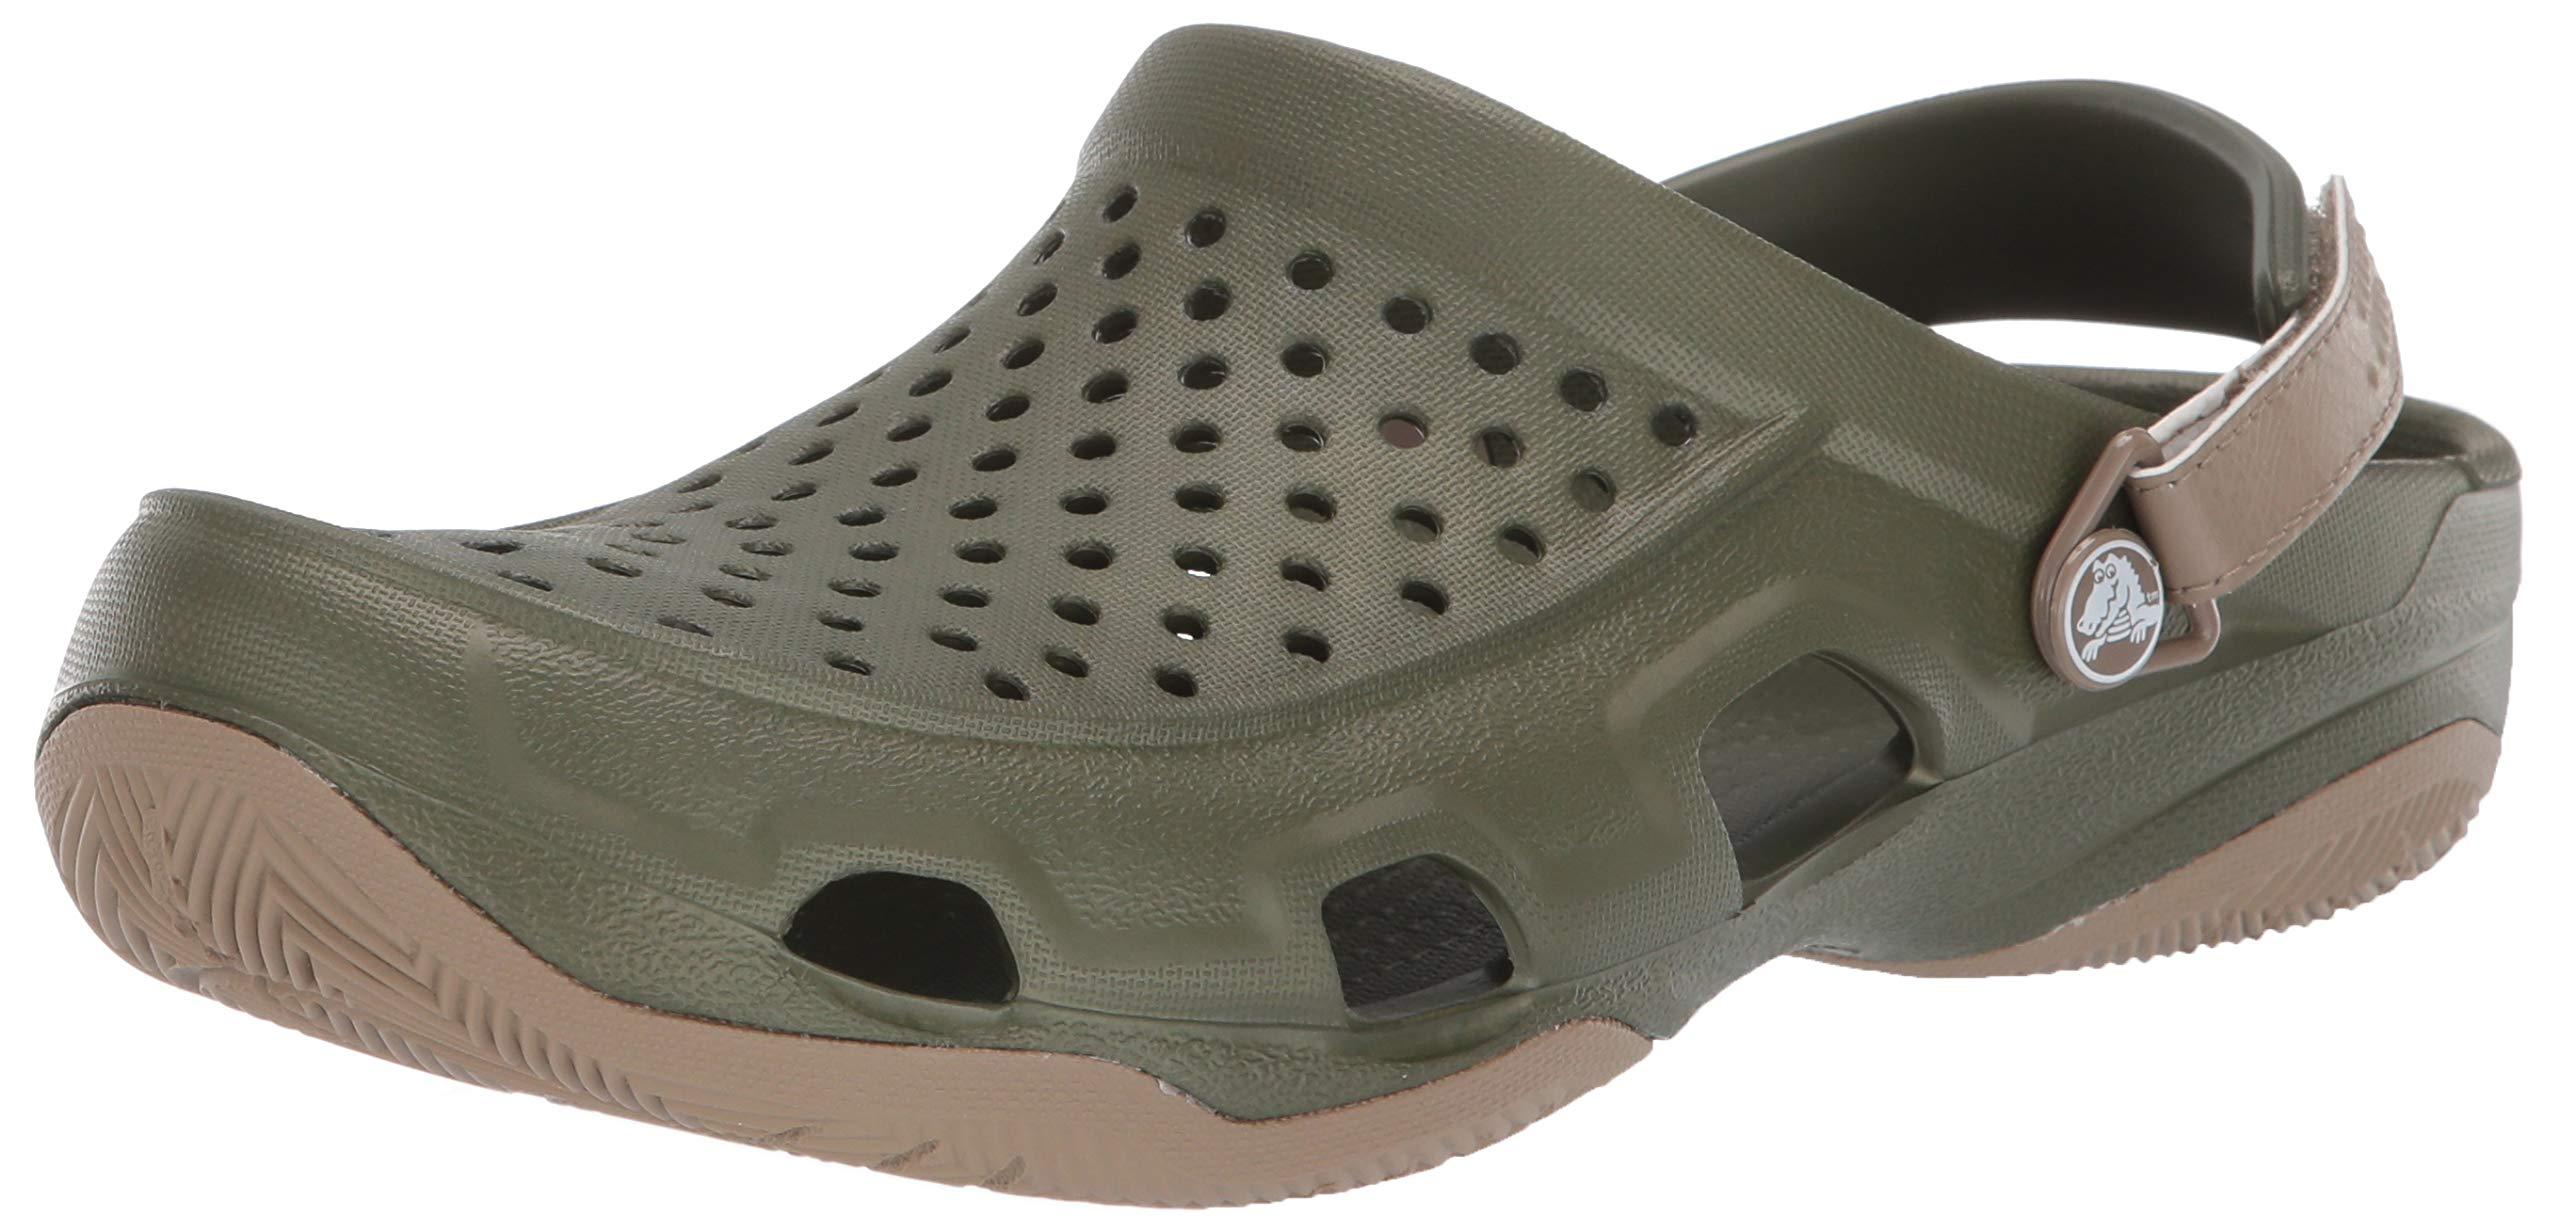 Crocs Men's Swiftwater Deck Clog